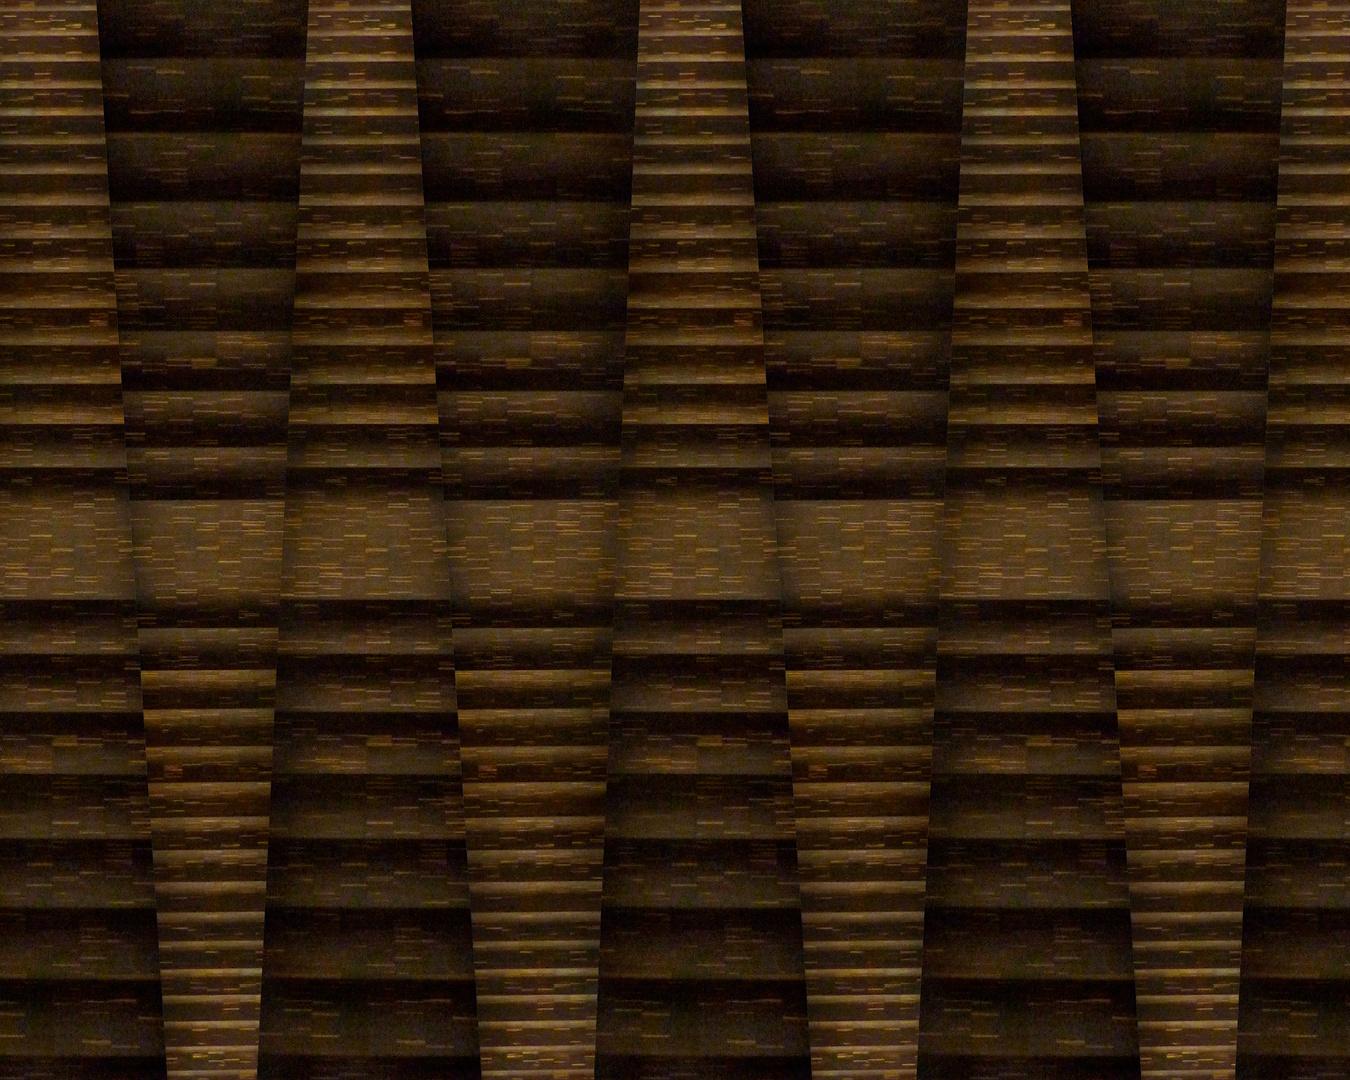 escaliers de (MW 201011127)